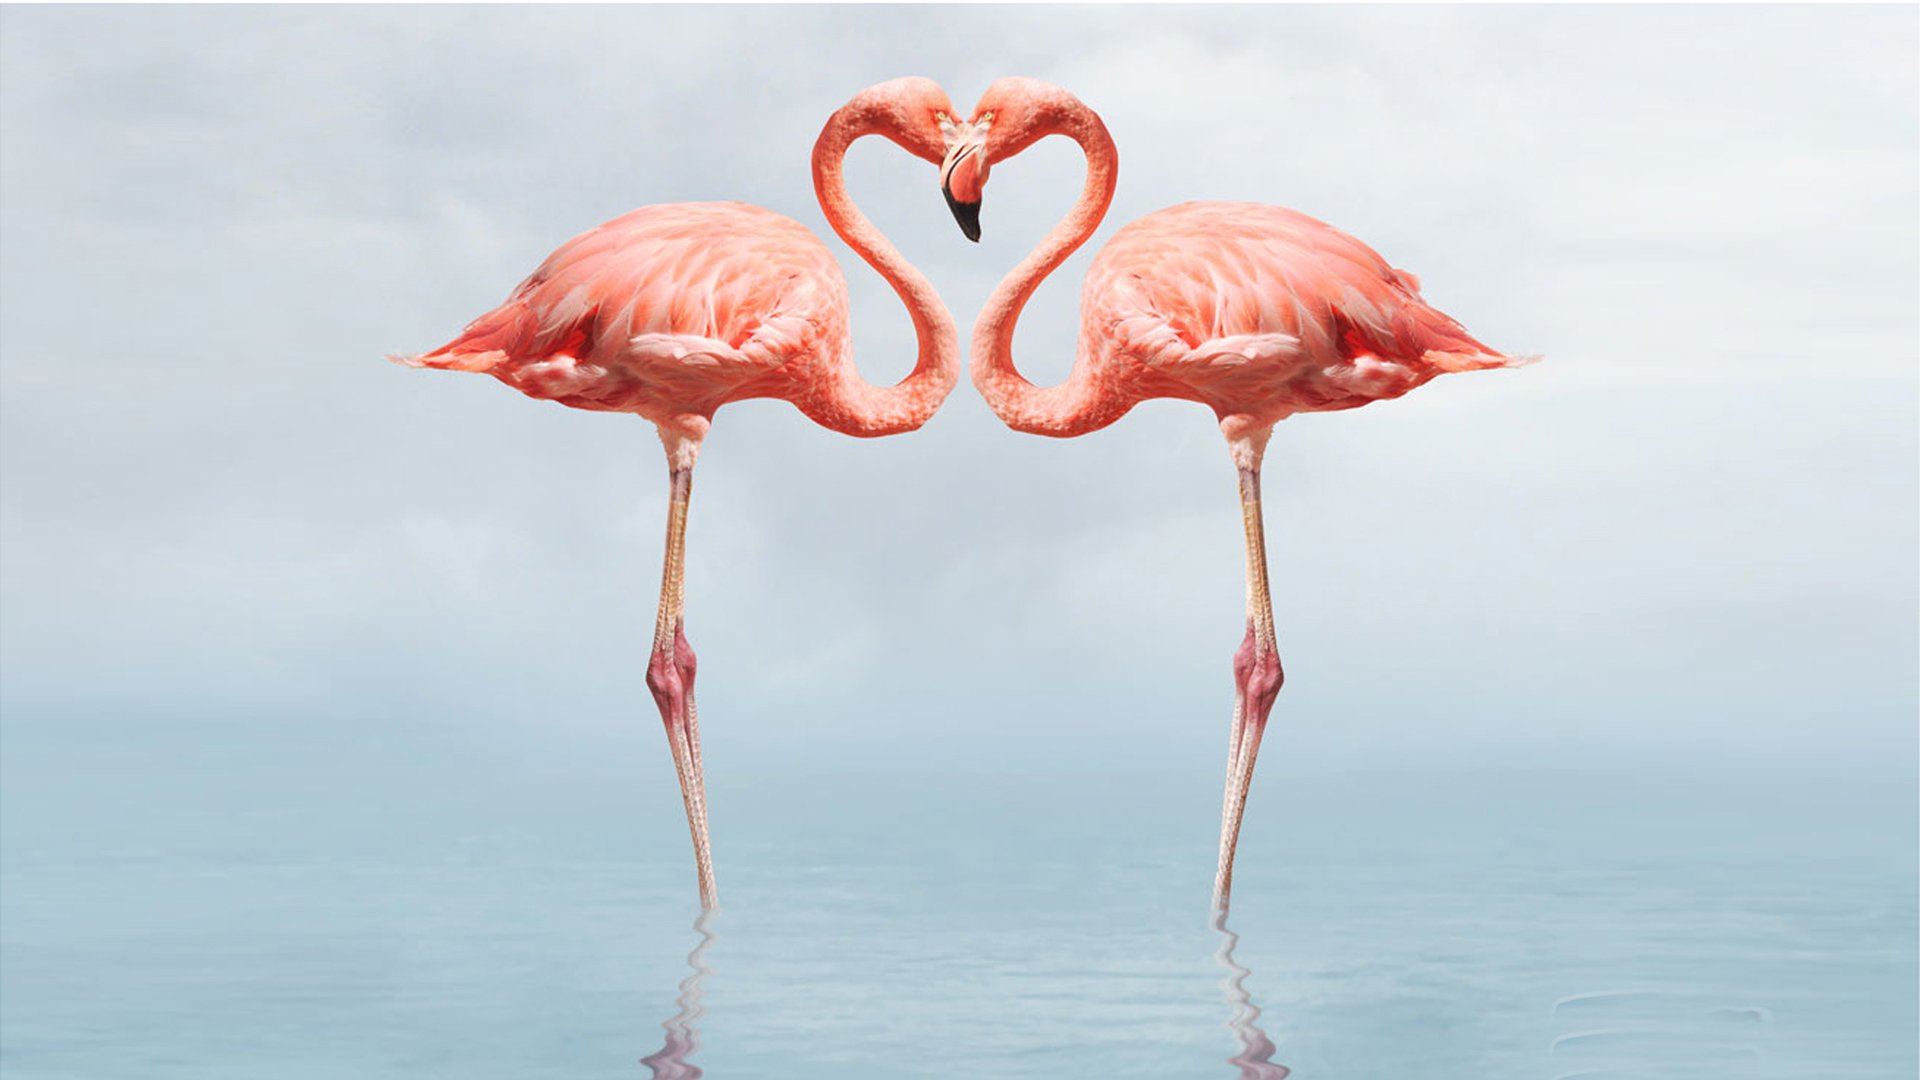 Flamingo Bird 1920x1080 Wallpaper Teahub Io